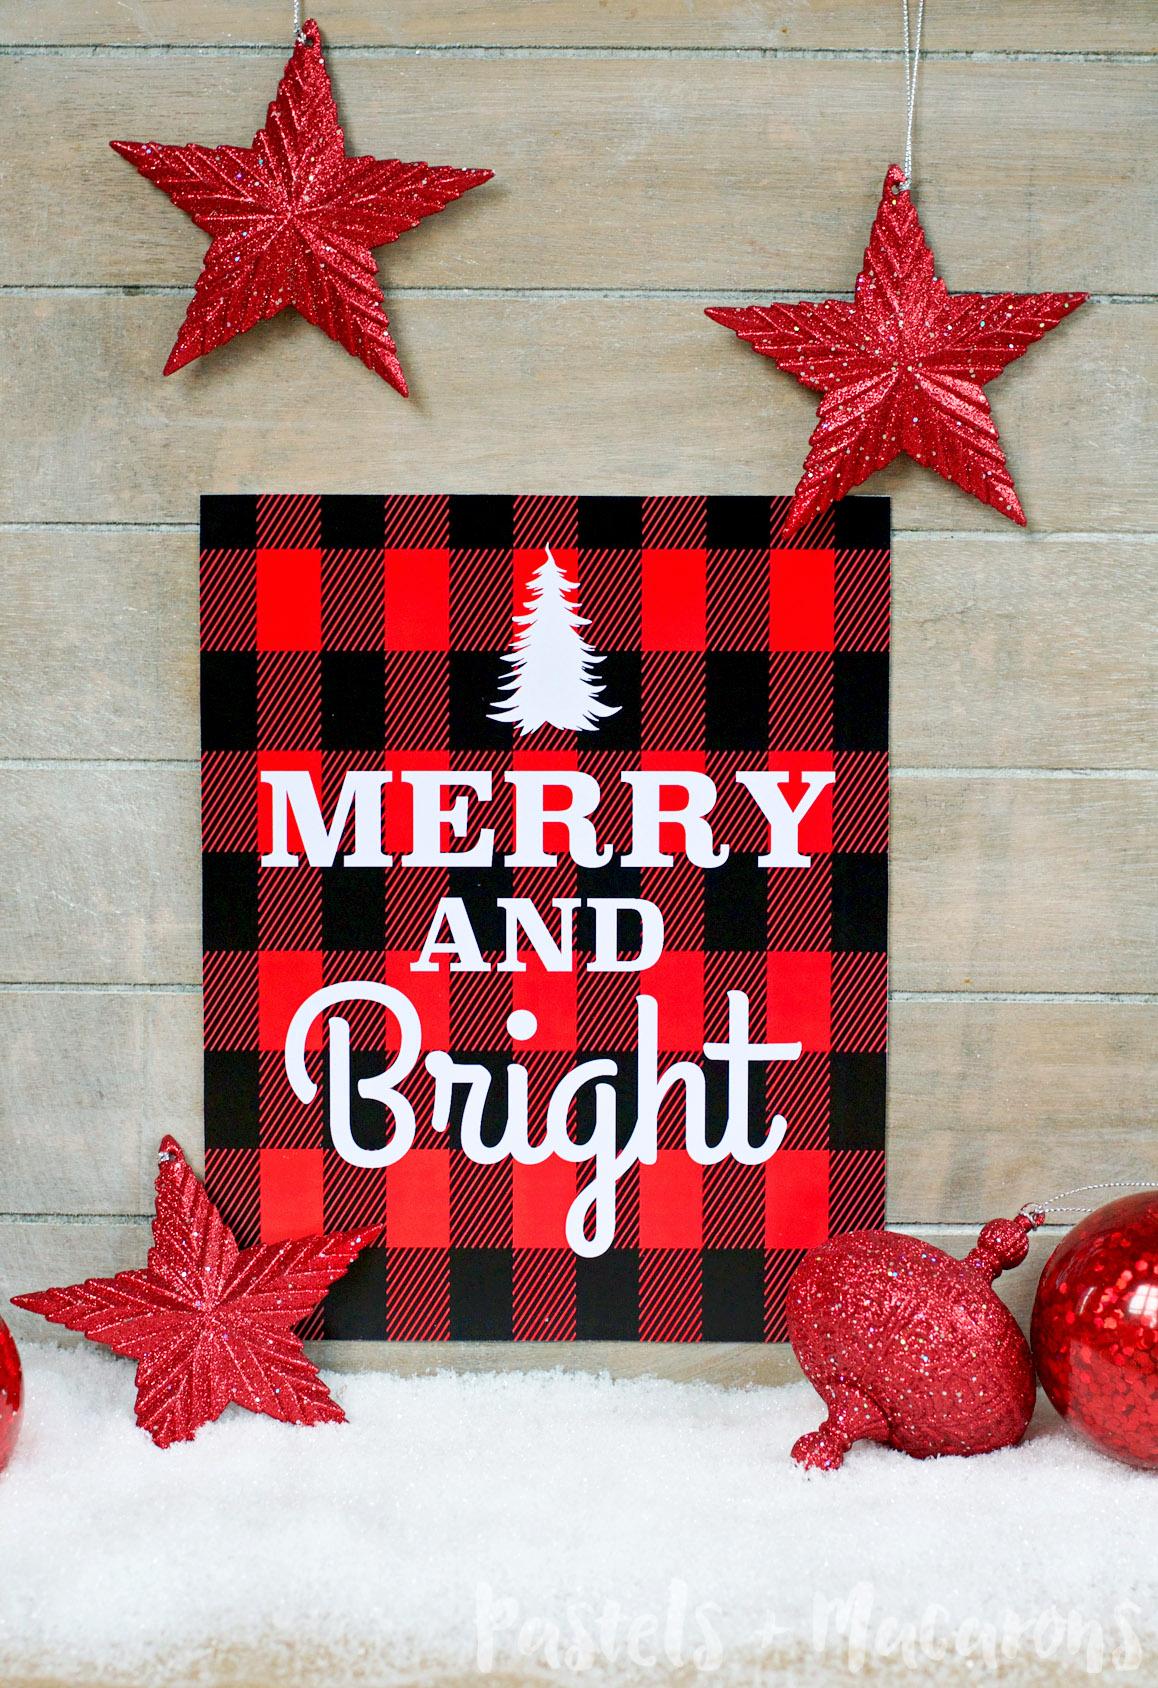 FREE Plaid Christmas Printable by Pastels & Macarons #freeplaidchristmasprintable #christmas #freechristmasprintable #freeprintable #plaid